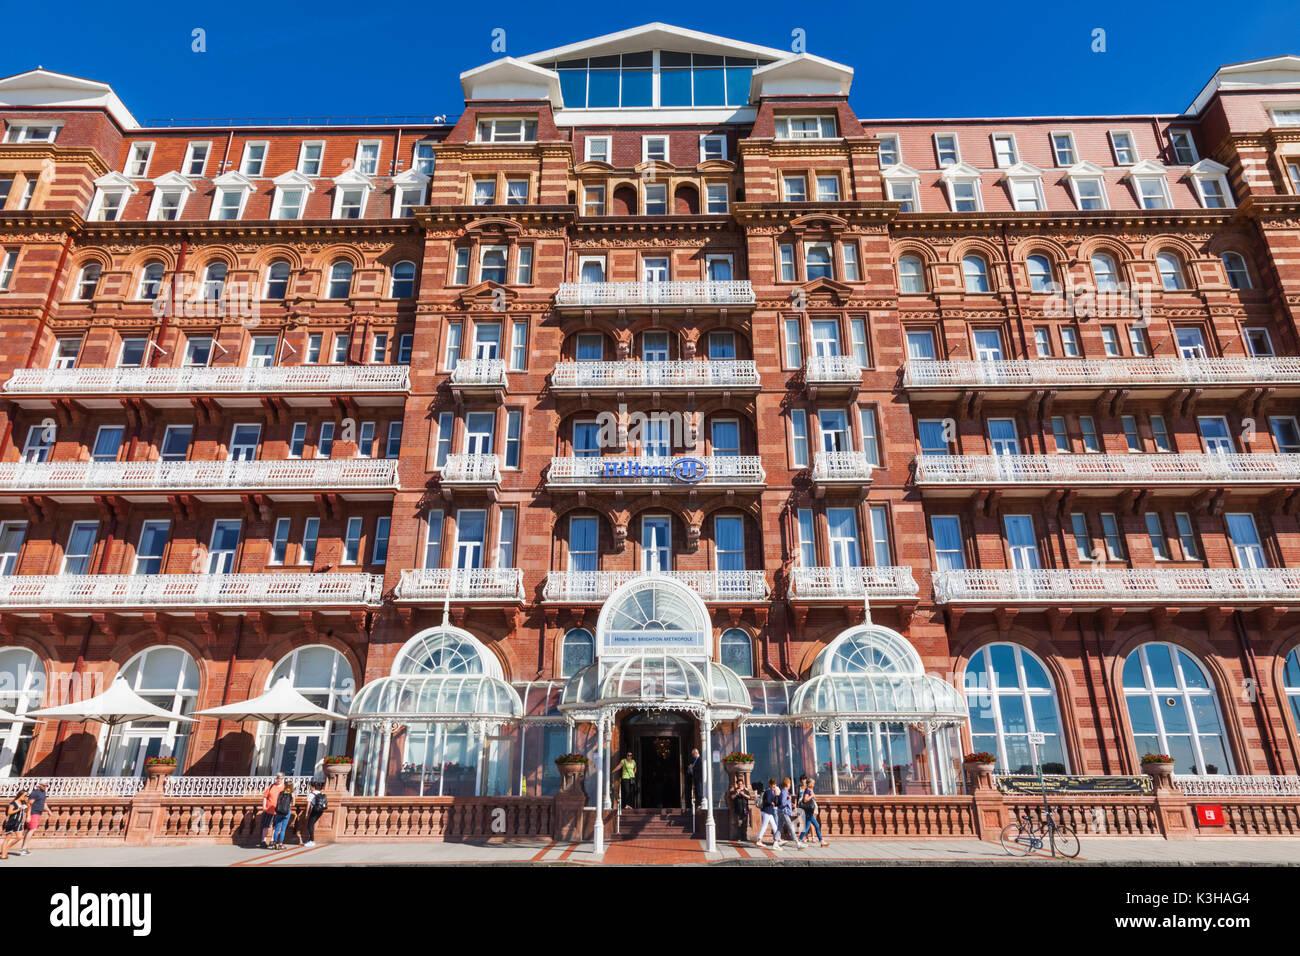 England, East Sussex, Brighton, Hilton Hotel - Stock Image